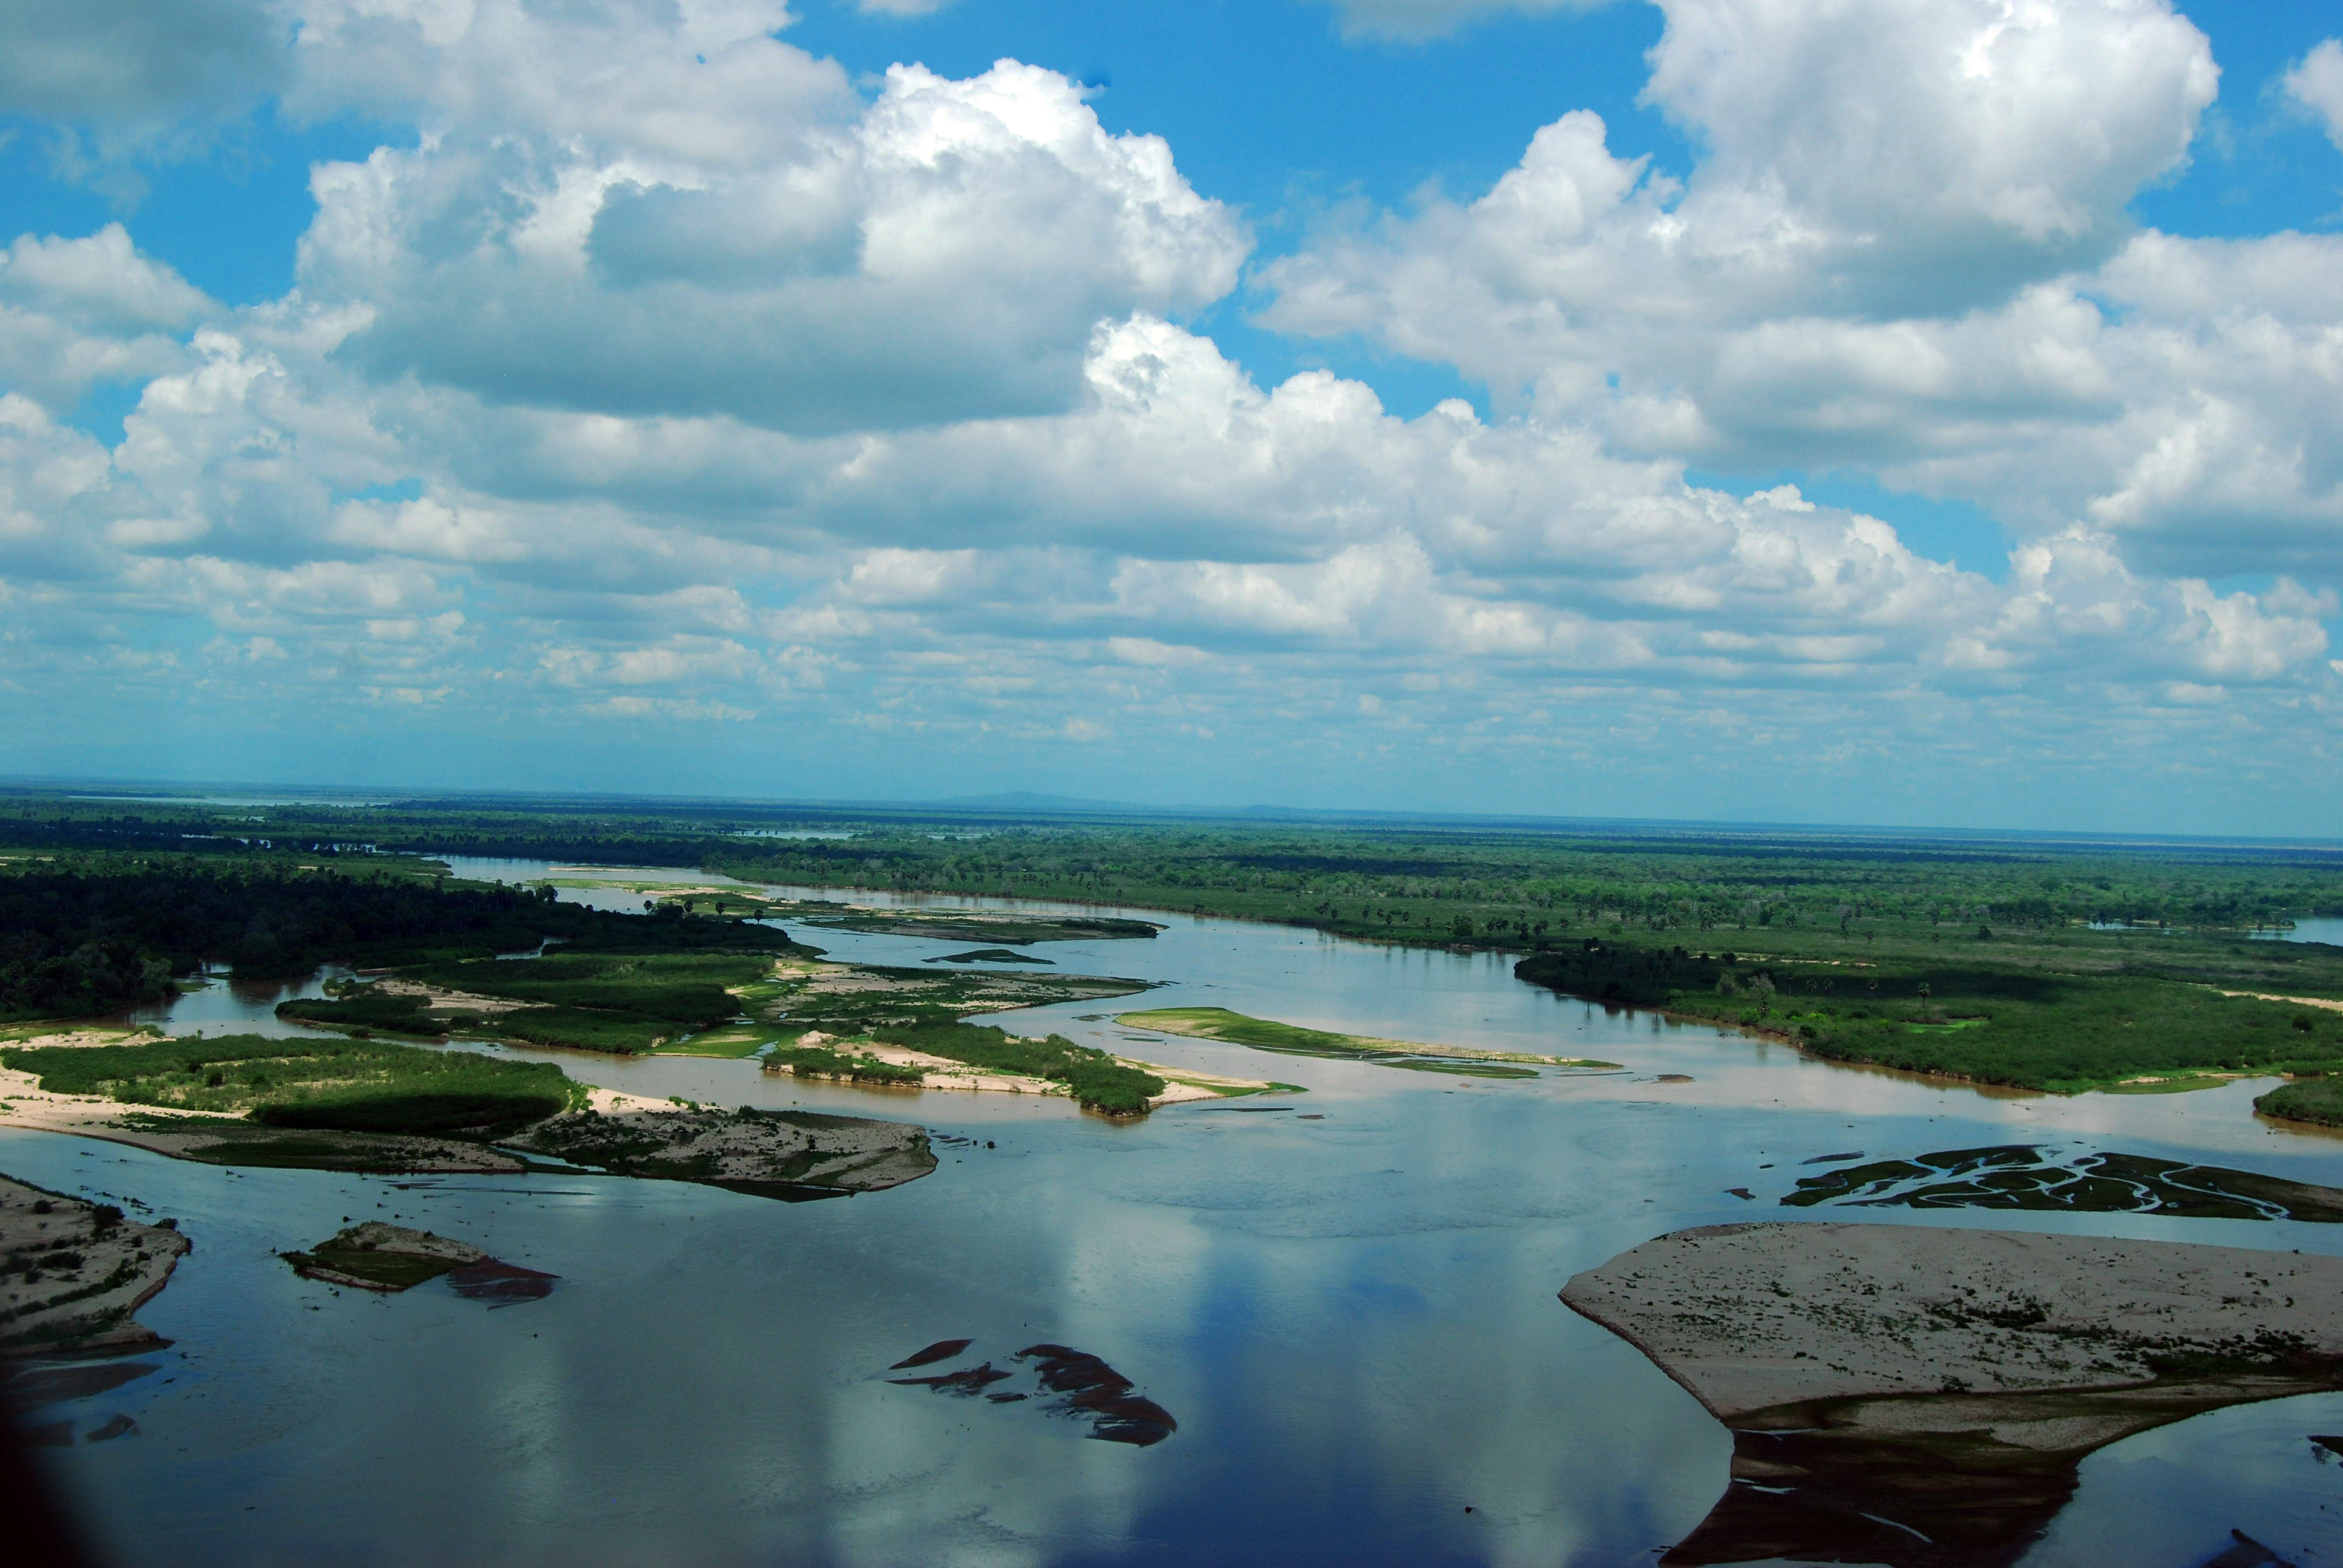 Rufiji Tanzania  city images : Rufiji River videos